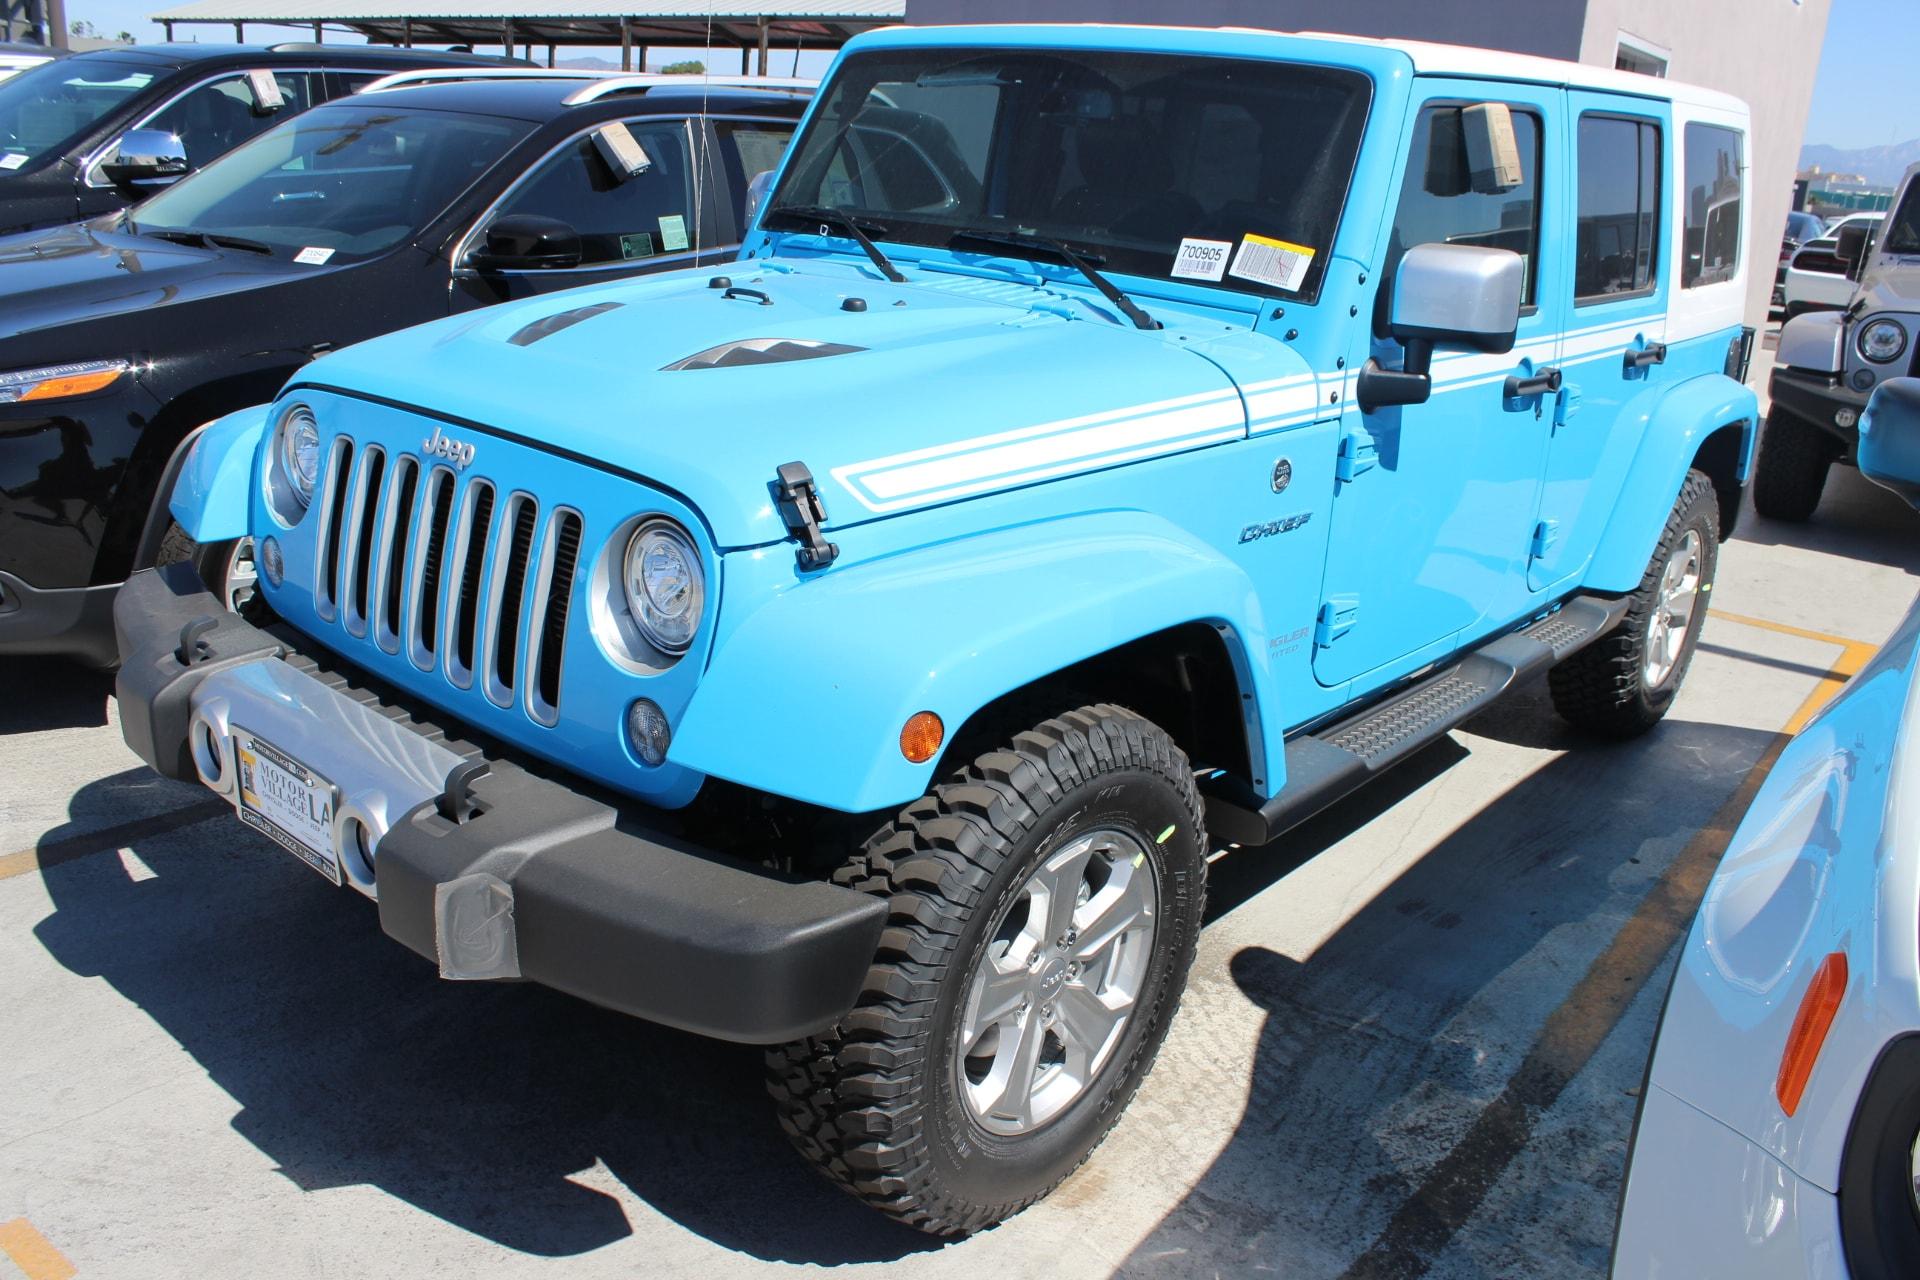 2017 Jeep Wrangler Unlimited Sahara 4x4  4-Wheel Drive Swing Gate Decal 40GB Hard Drive w28GB A